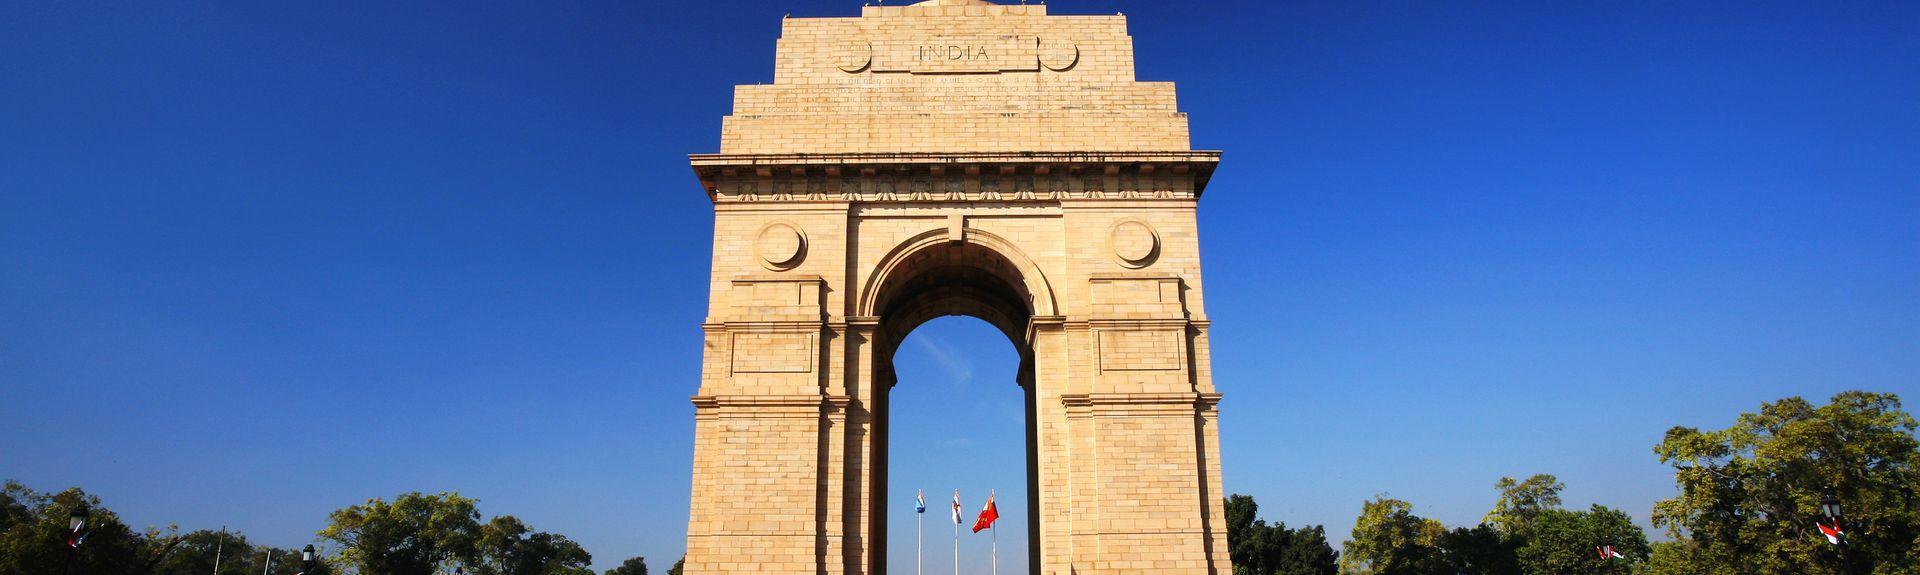 New Delhi, Delhi, India